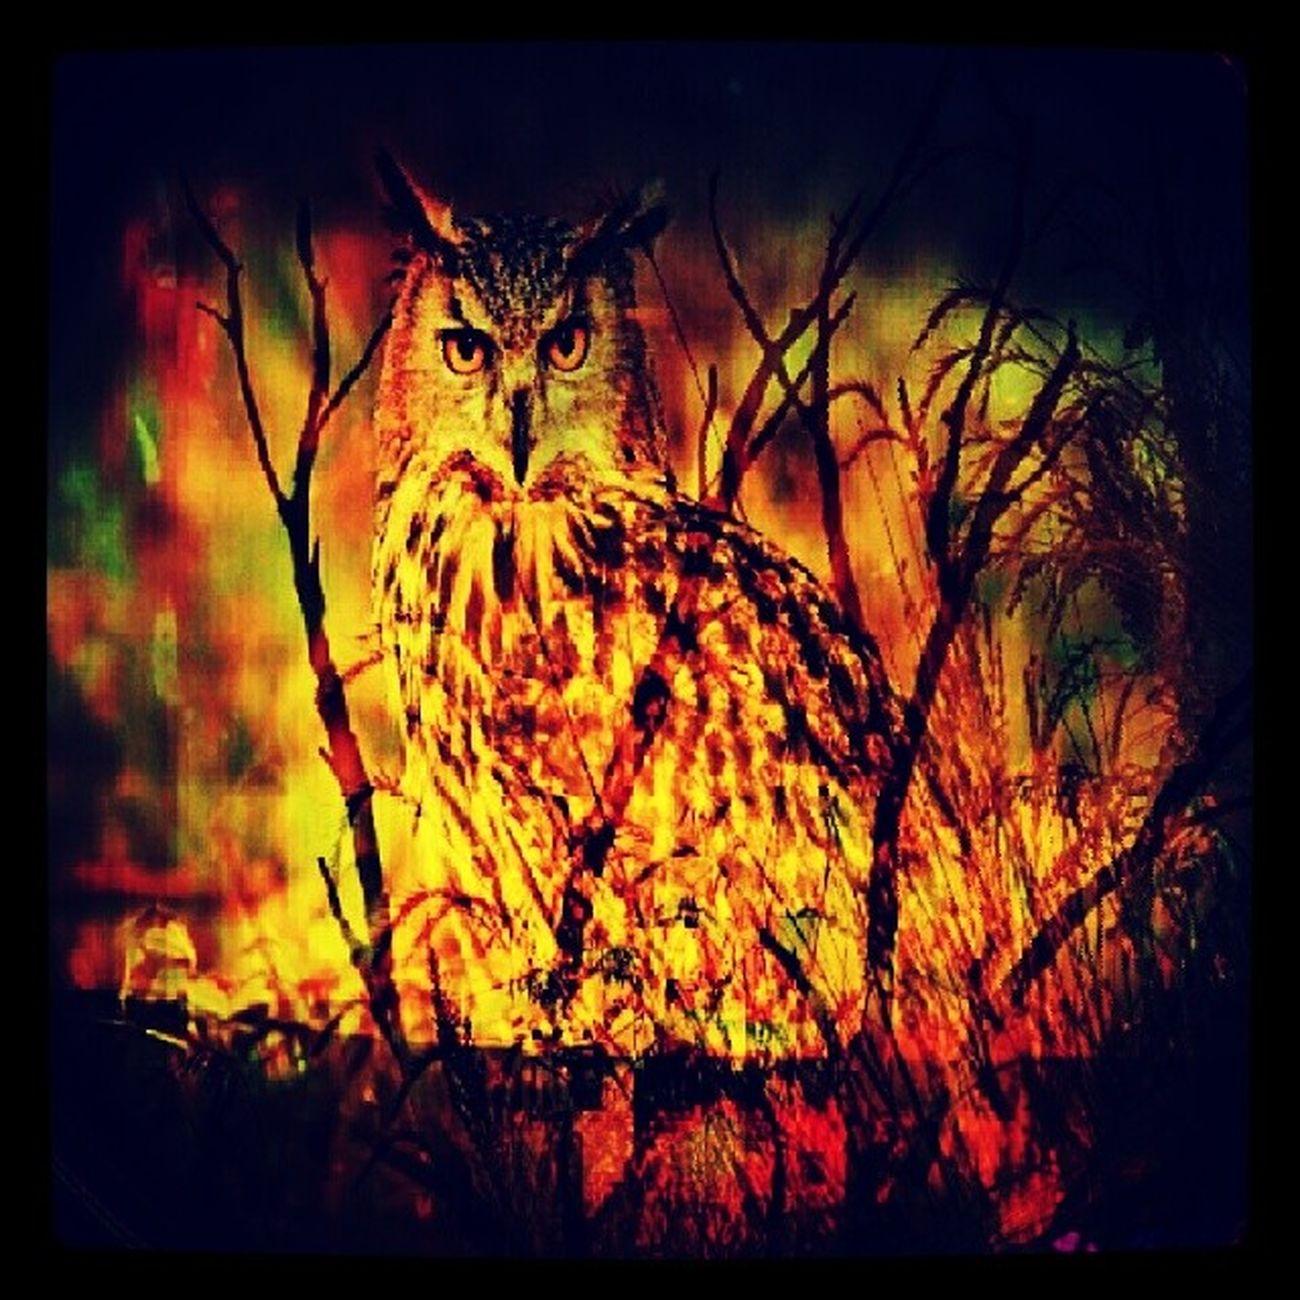 Streamzoofamily Streamzoo ScavengerHuntChallenge SH_Hdr Nature wildlife photography IG_Allstars IG_Nature heyfred_lookatthis allshots_ hashtagfloosie fortheloveofediting MyBest MySecretFascination instamood instagood Ig_daily checkthisout